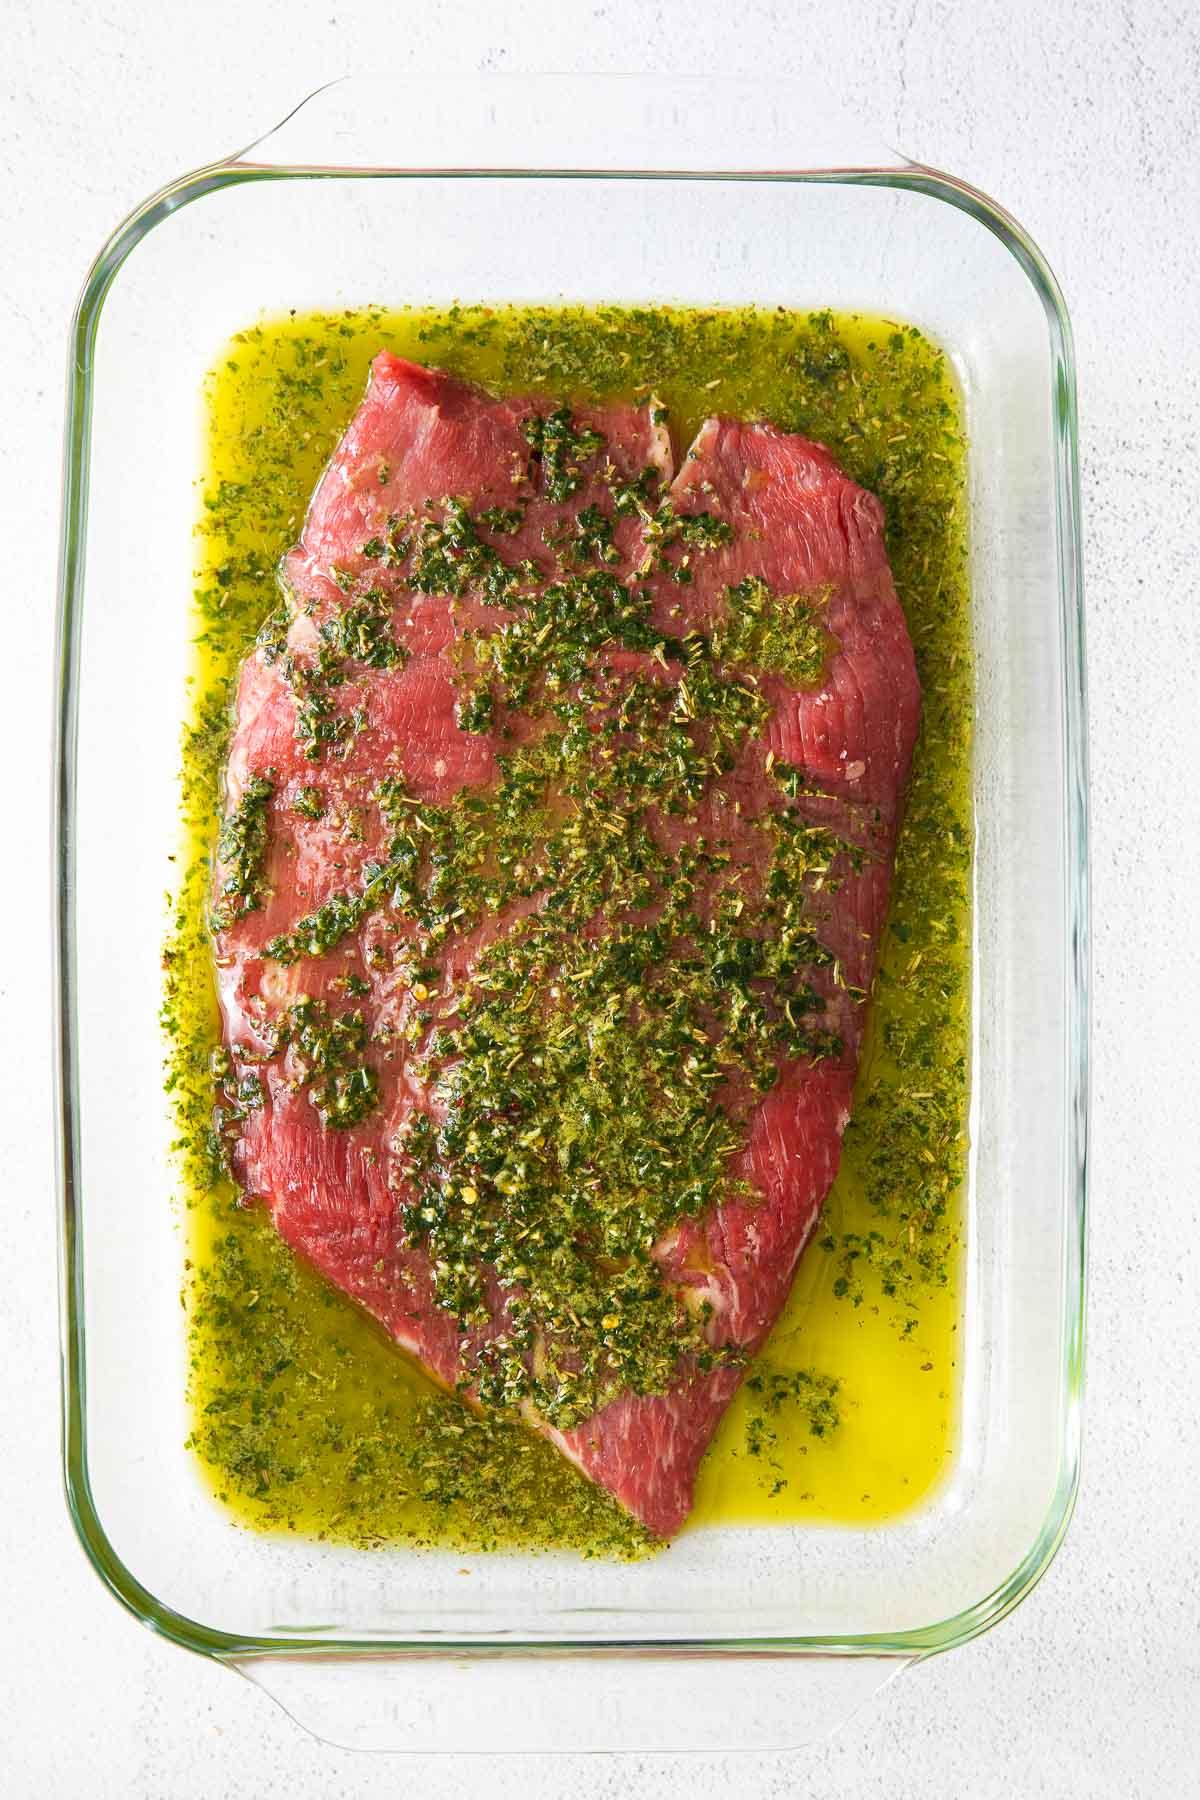 glass dish with raw flank steak marinading in green chimichurri sauce